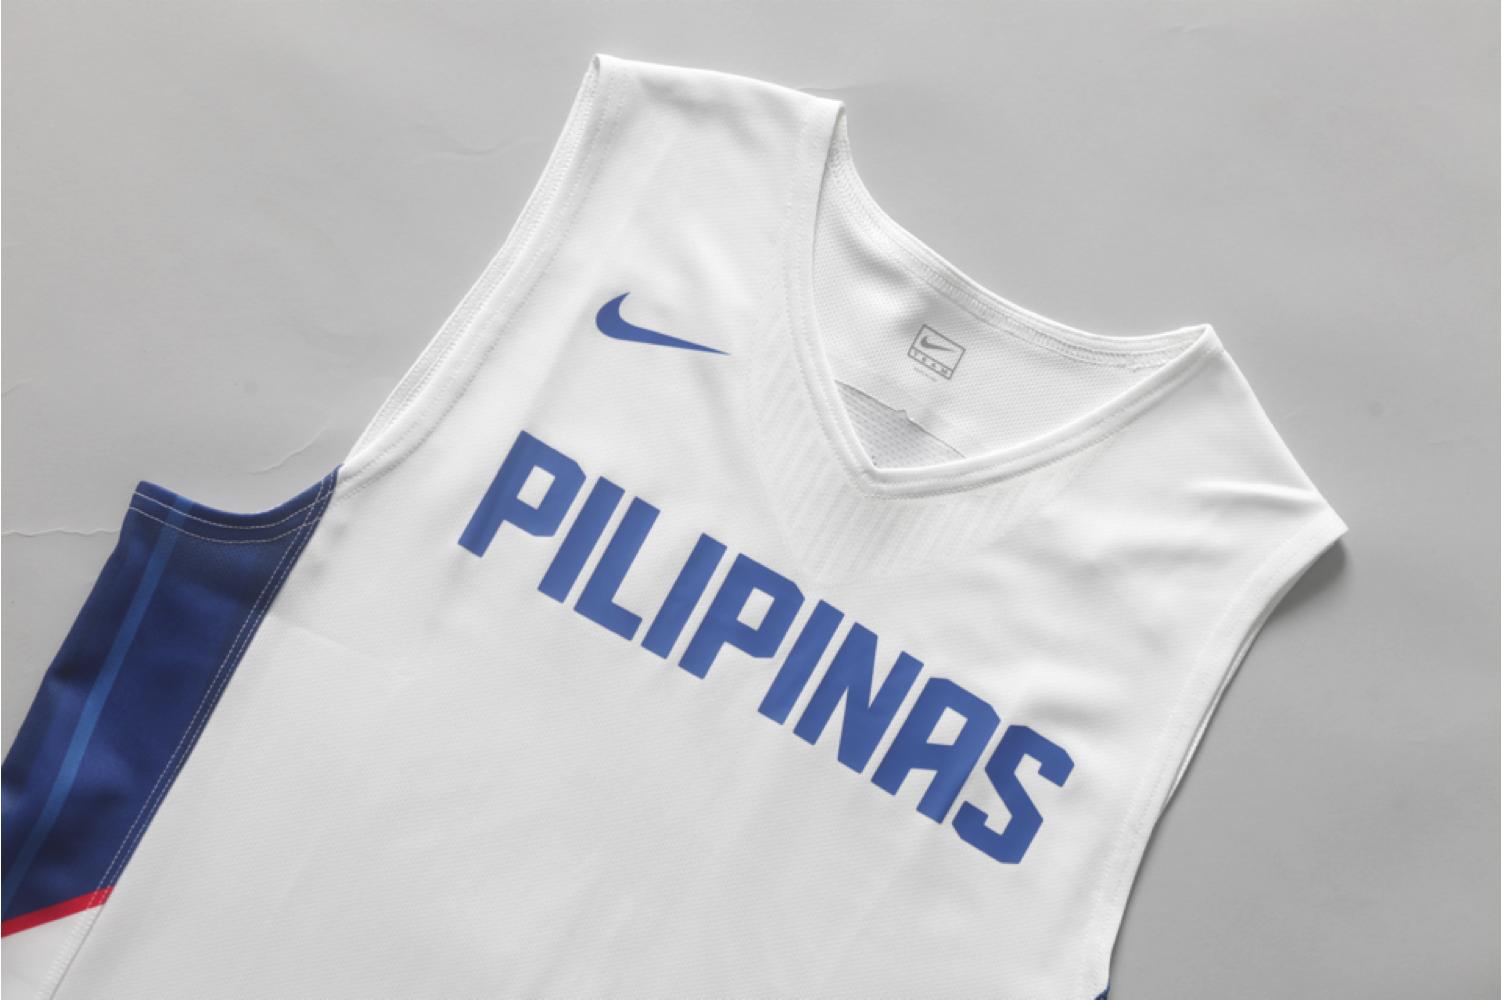 Philippine Team Kit